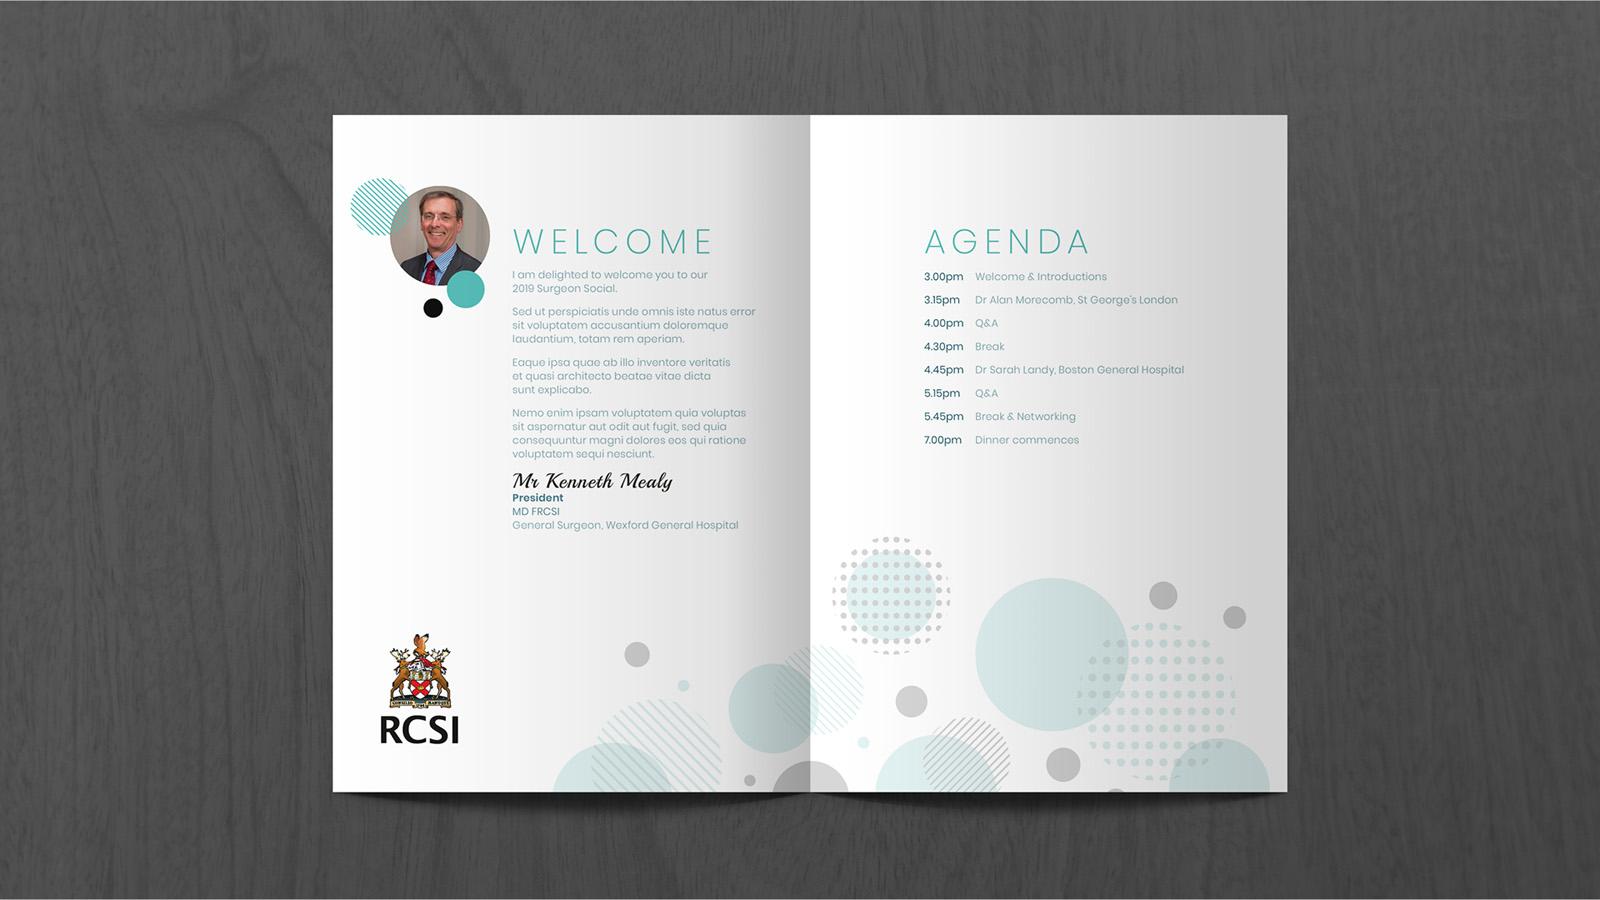 RCSI_Event_Presentation_Portfolio_9